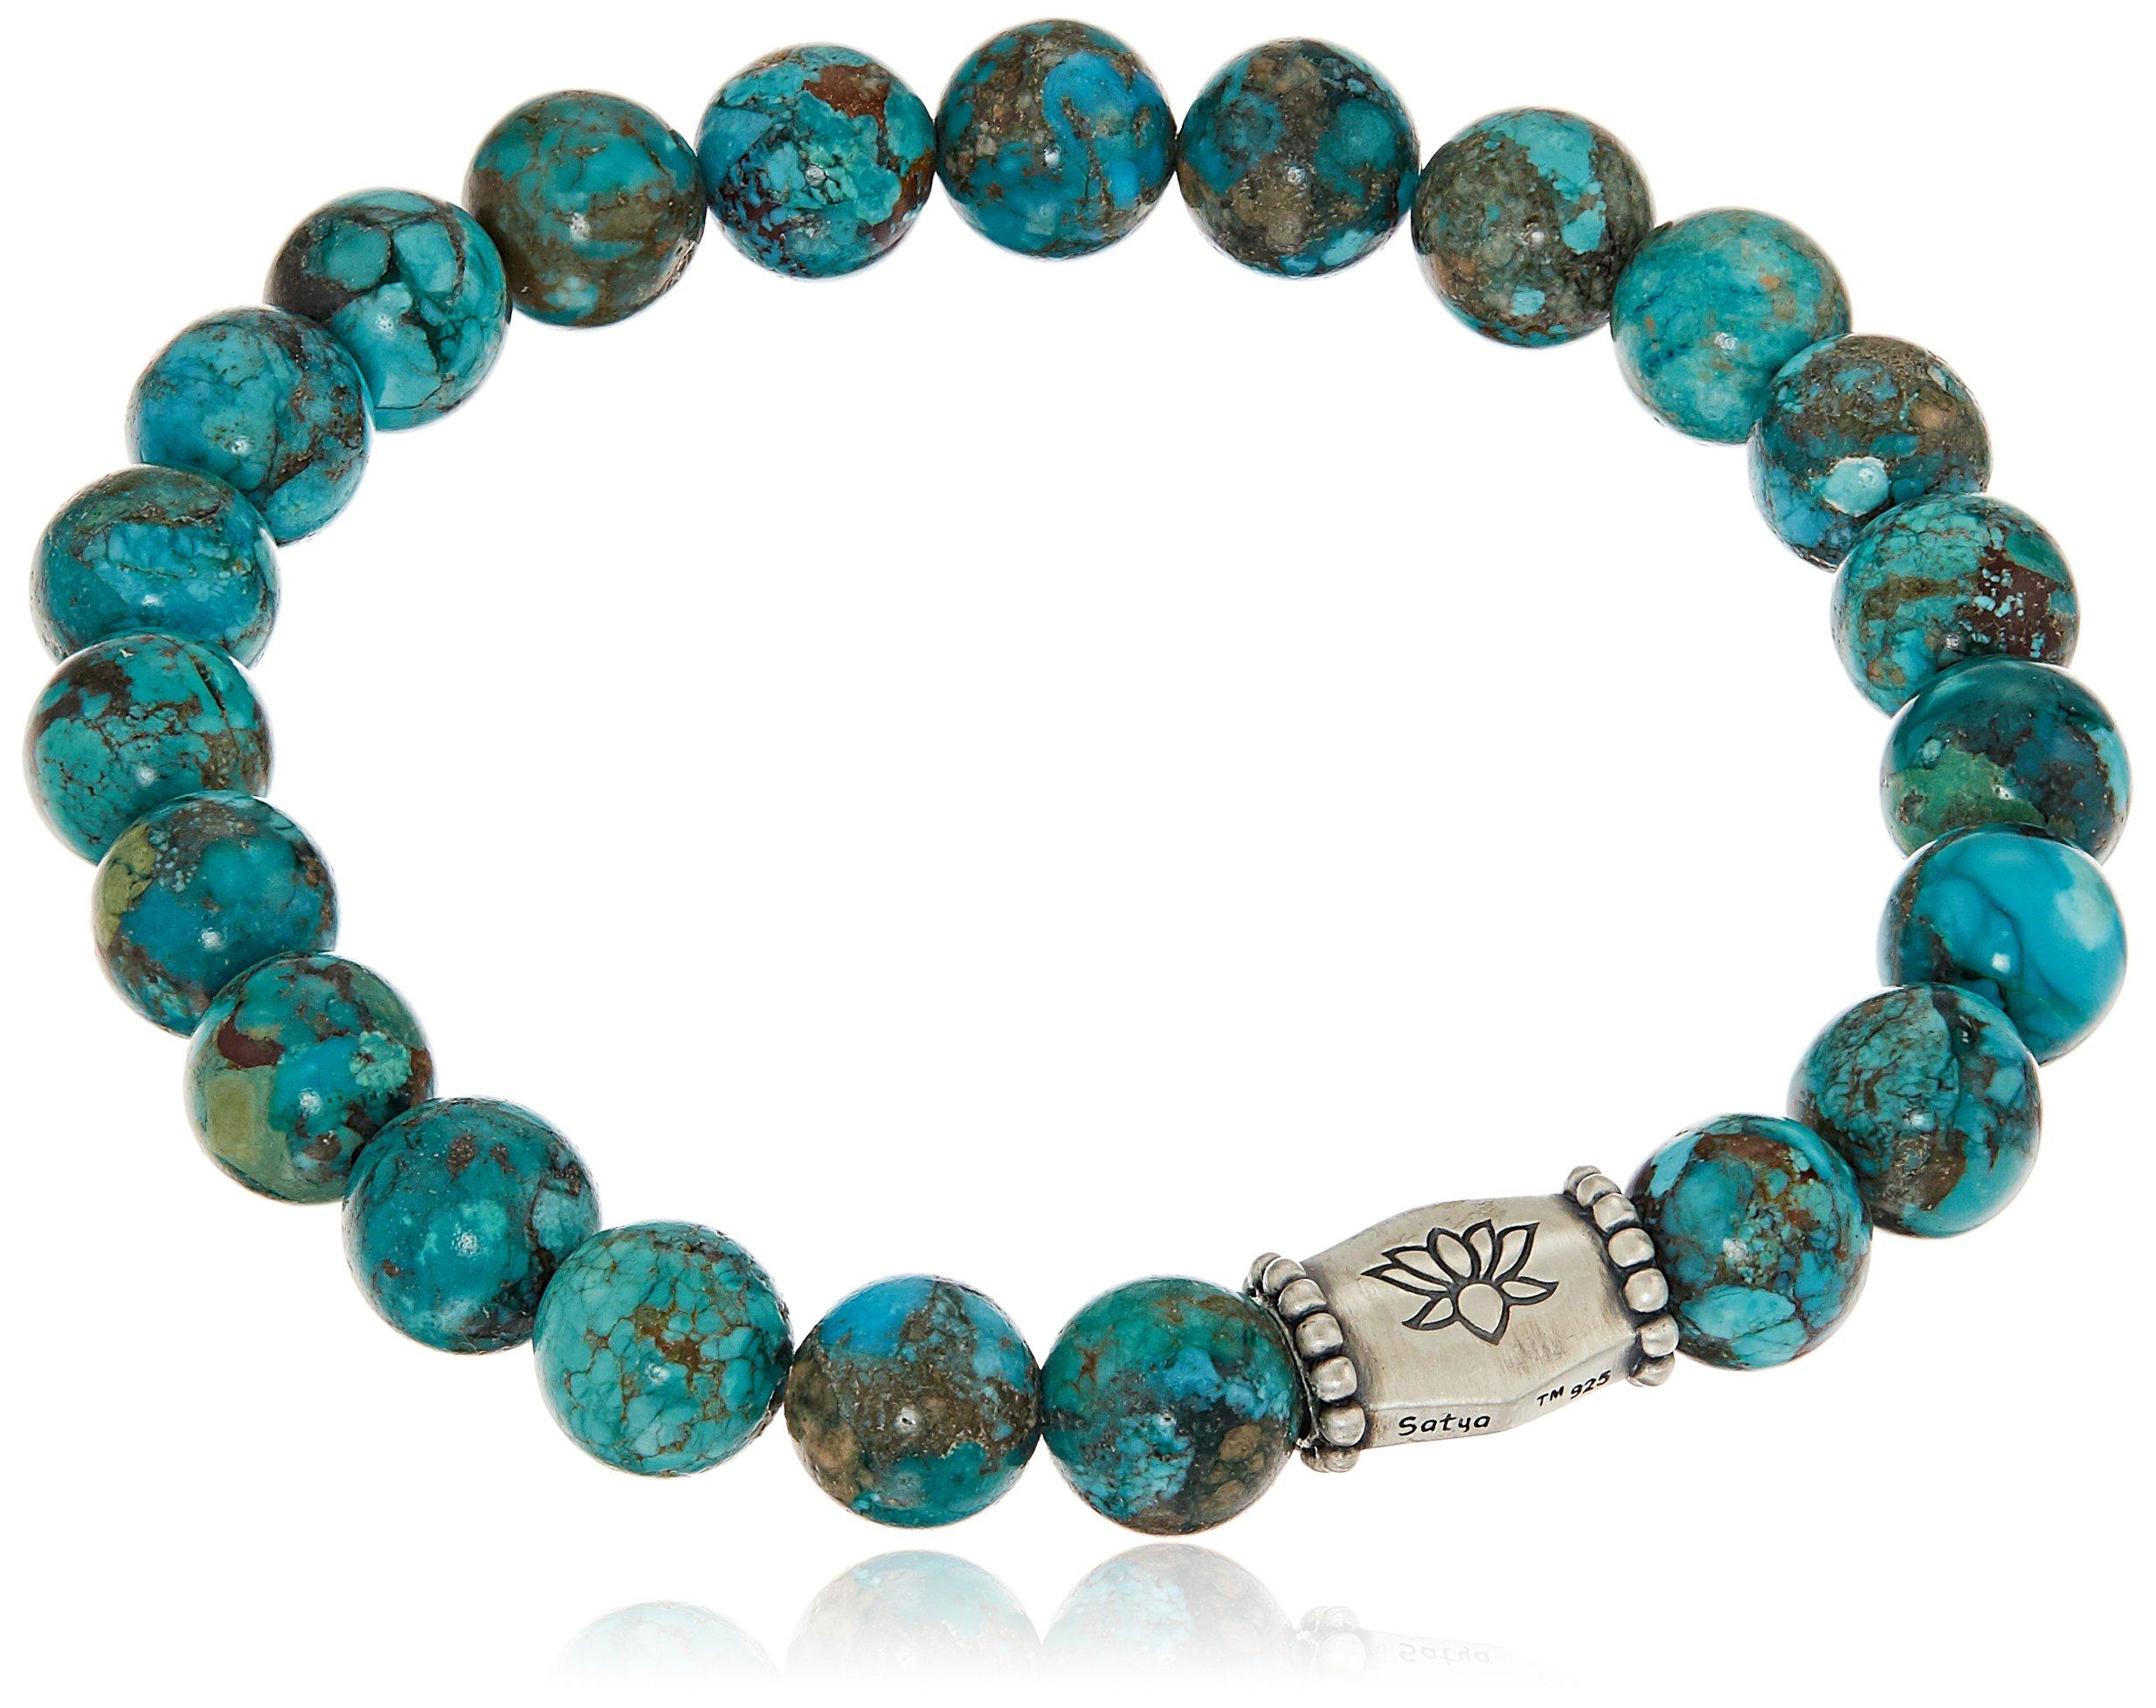 Satya Jewelry 8mm Turquoise Silver Lotus Barrel Stretch Bracelet